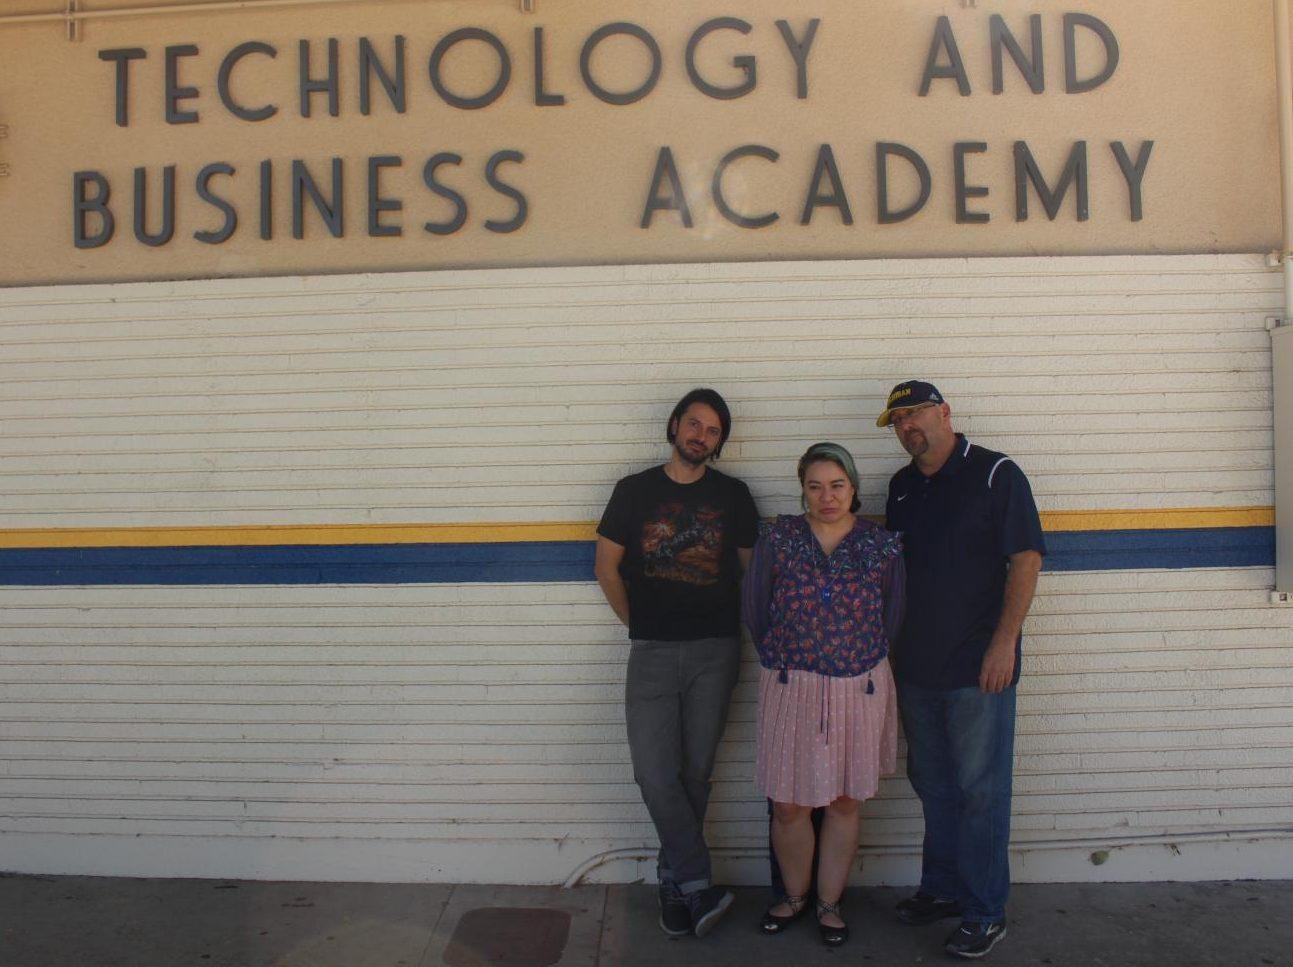 Left to right: Mr.Stone, Ms.Henneman, Mr.Monaster(Lead Teacher of Tech & Biz)